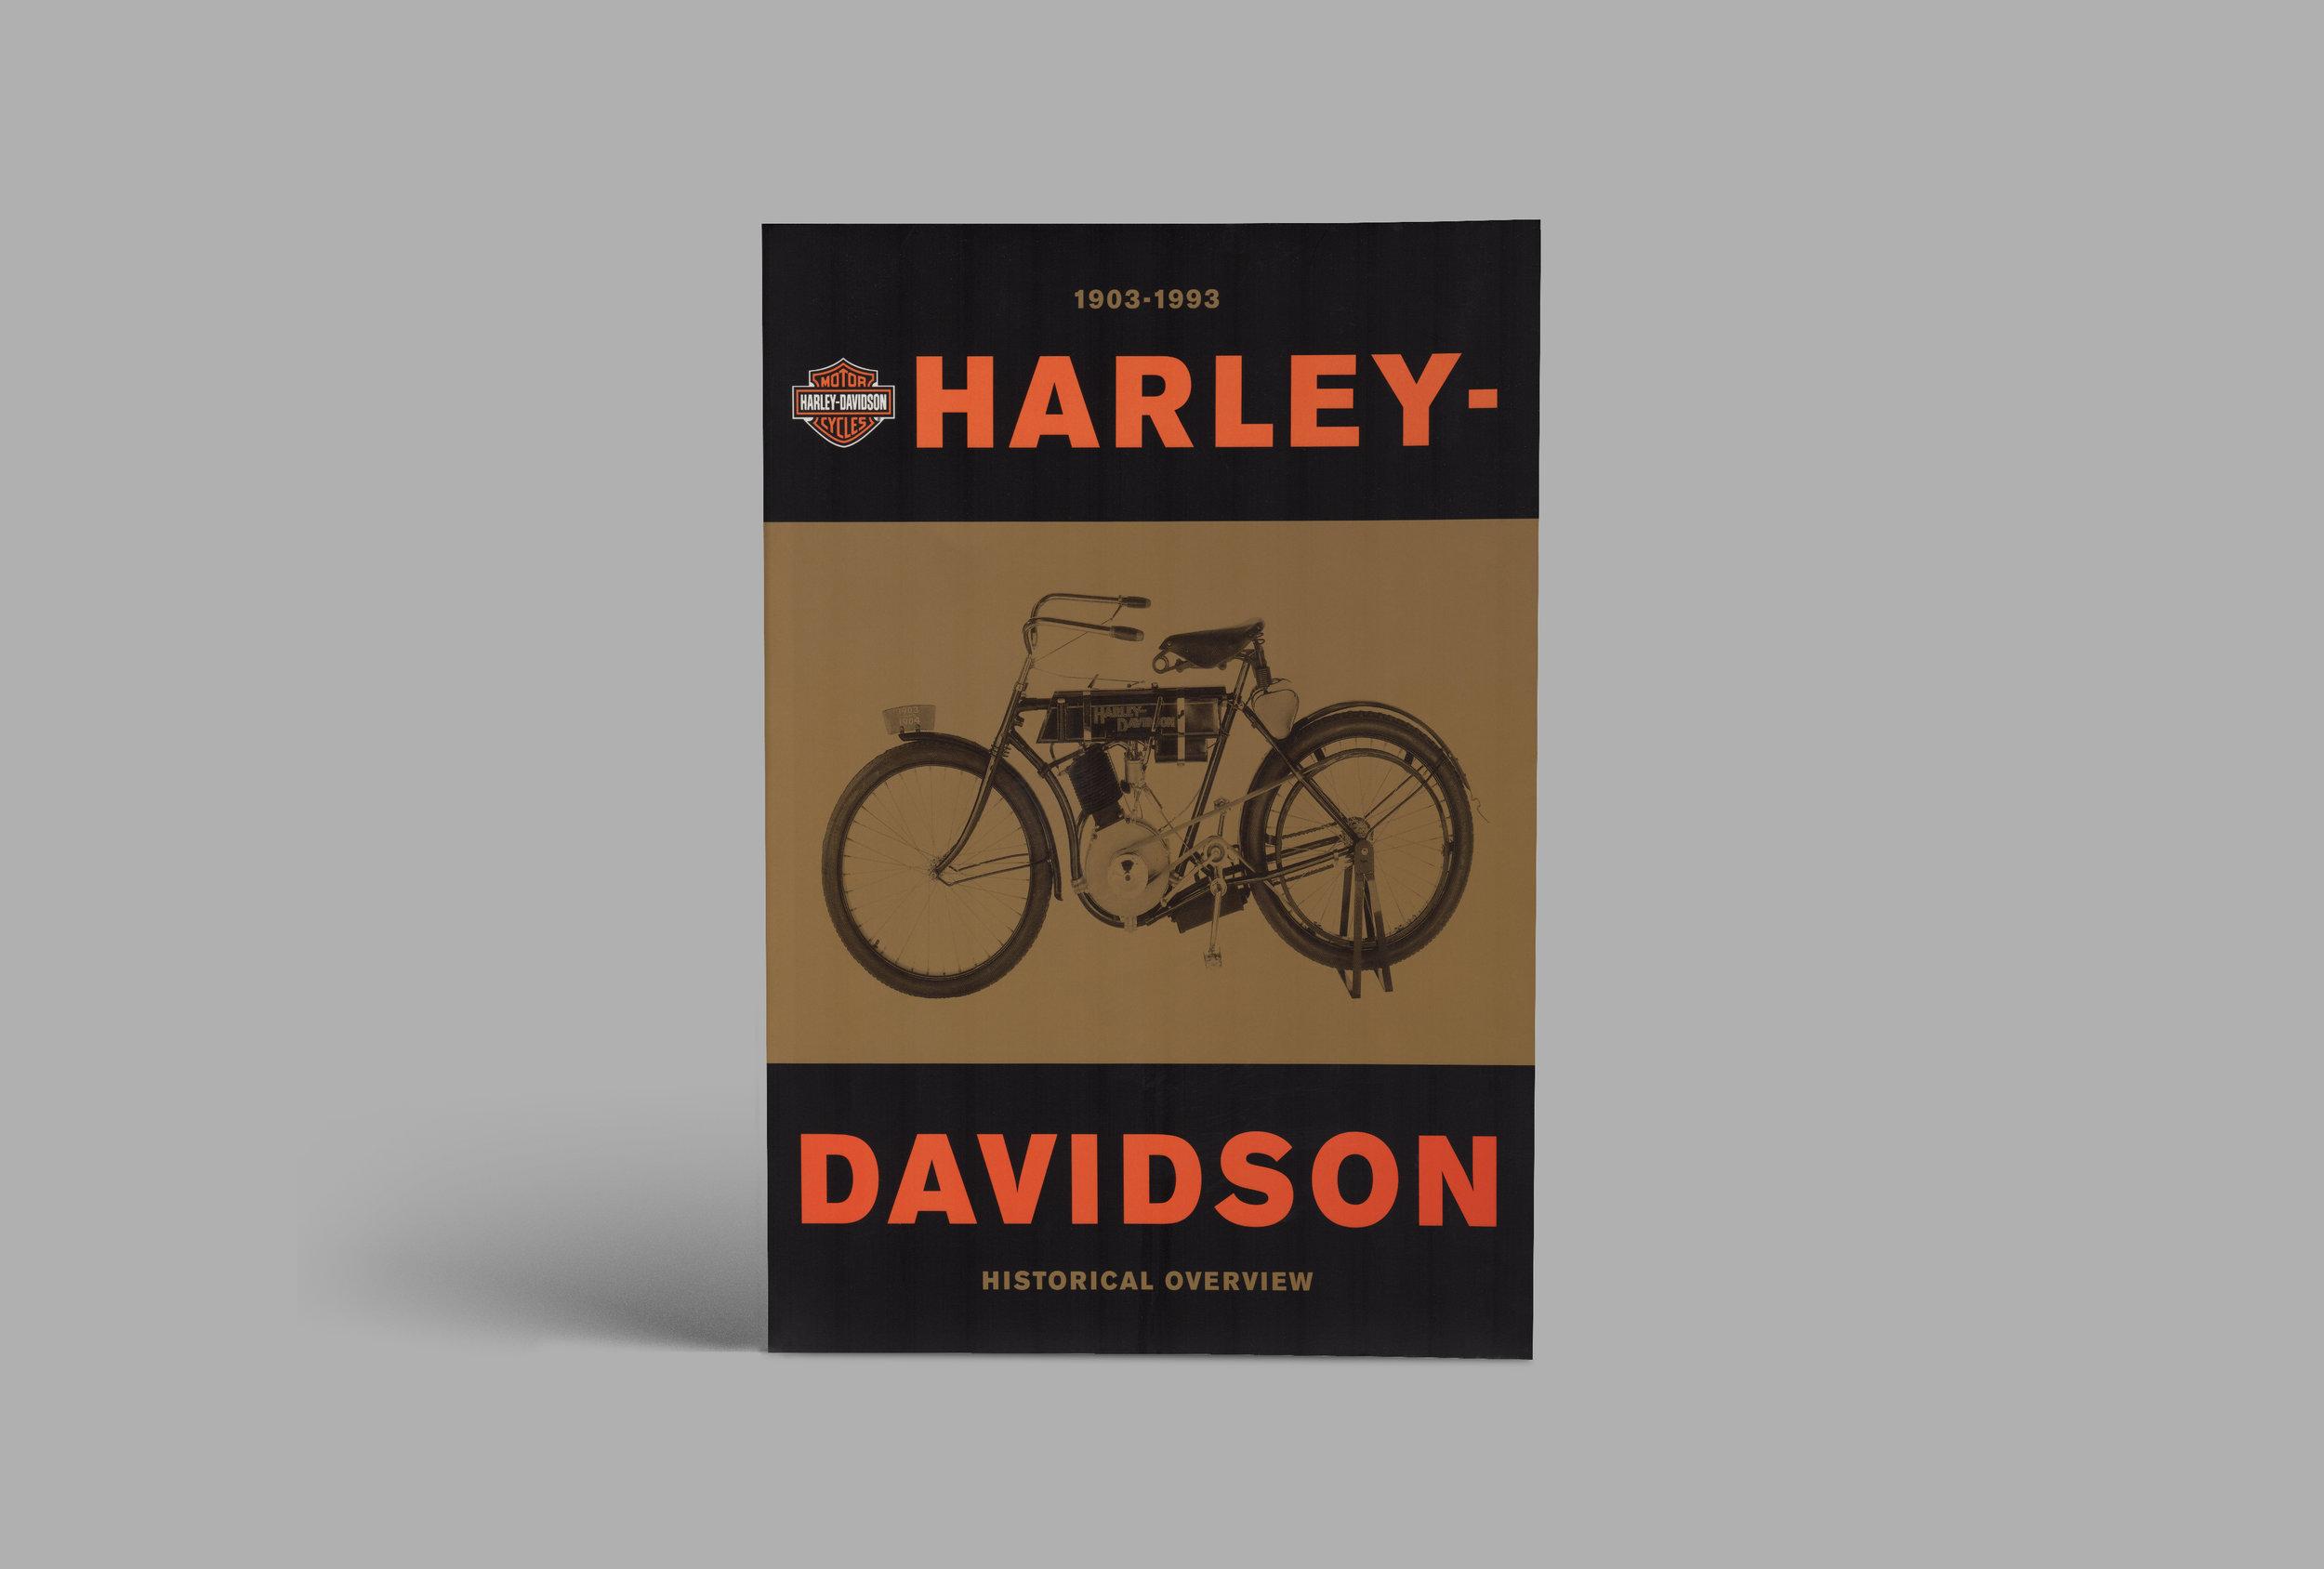 3D_harley_cover_4000w.jpg